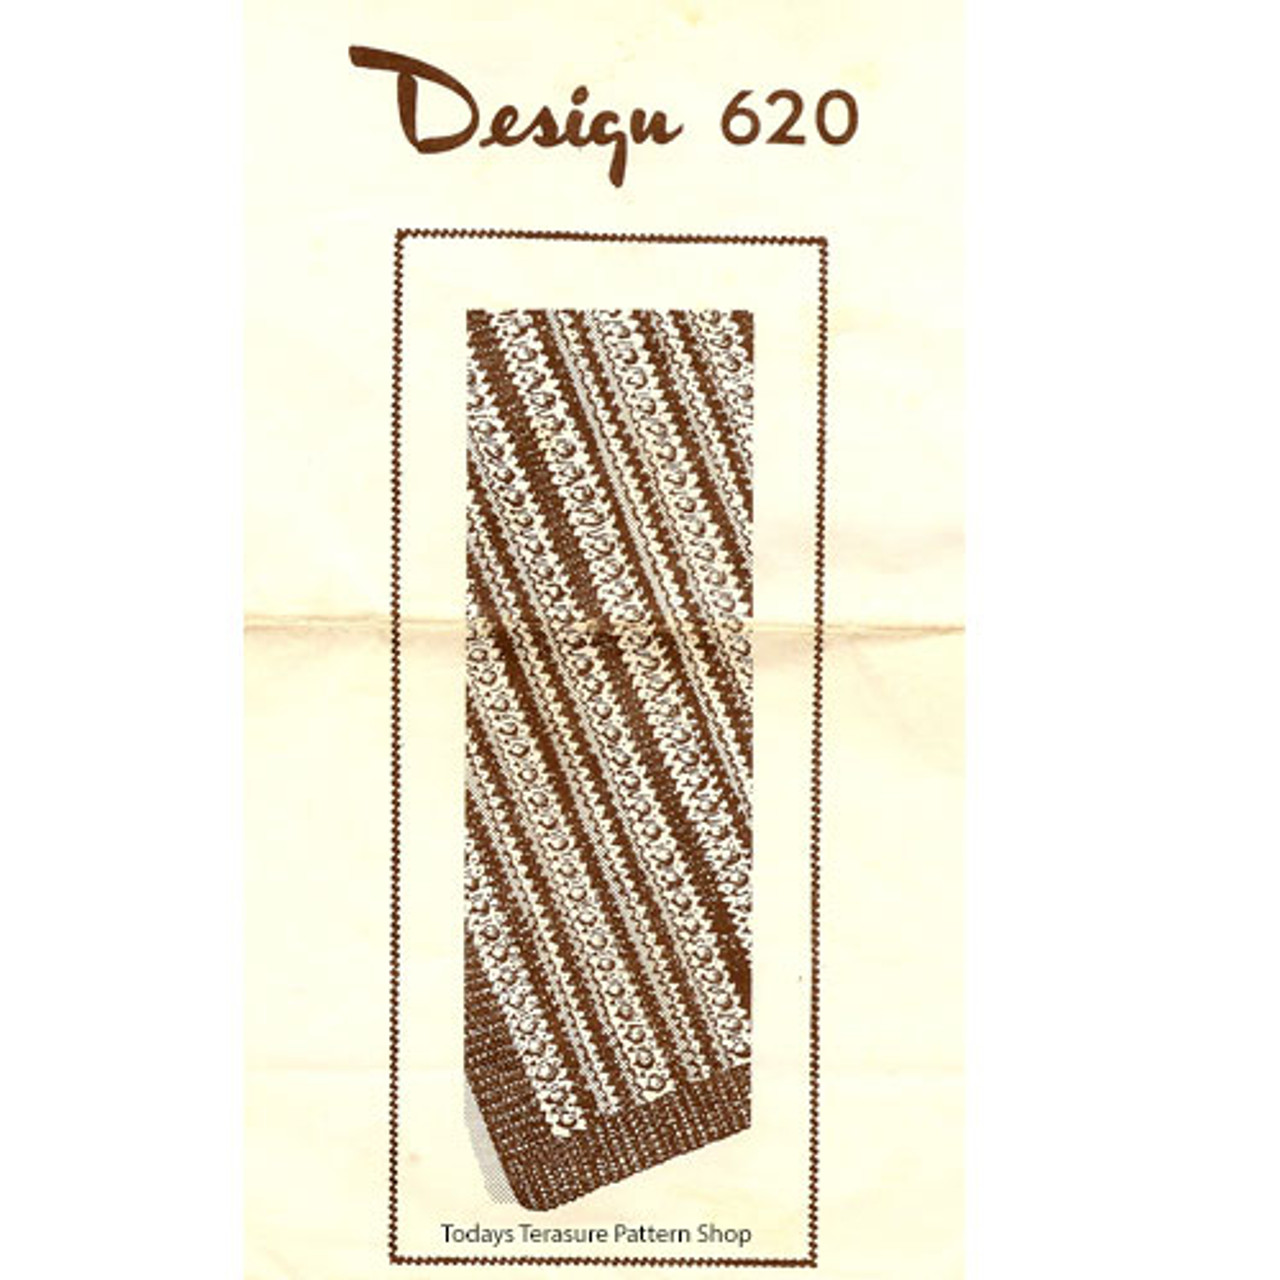 Crochet Striped Afghan Pattern, Popcorns, Mail Order 620